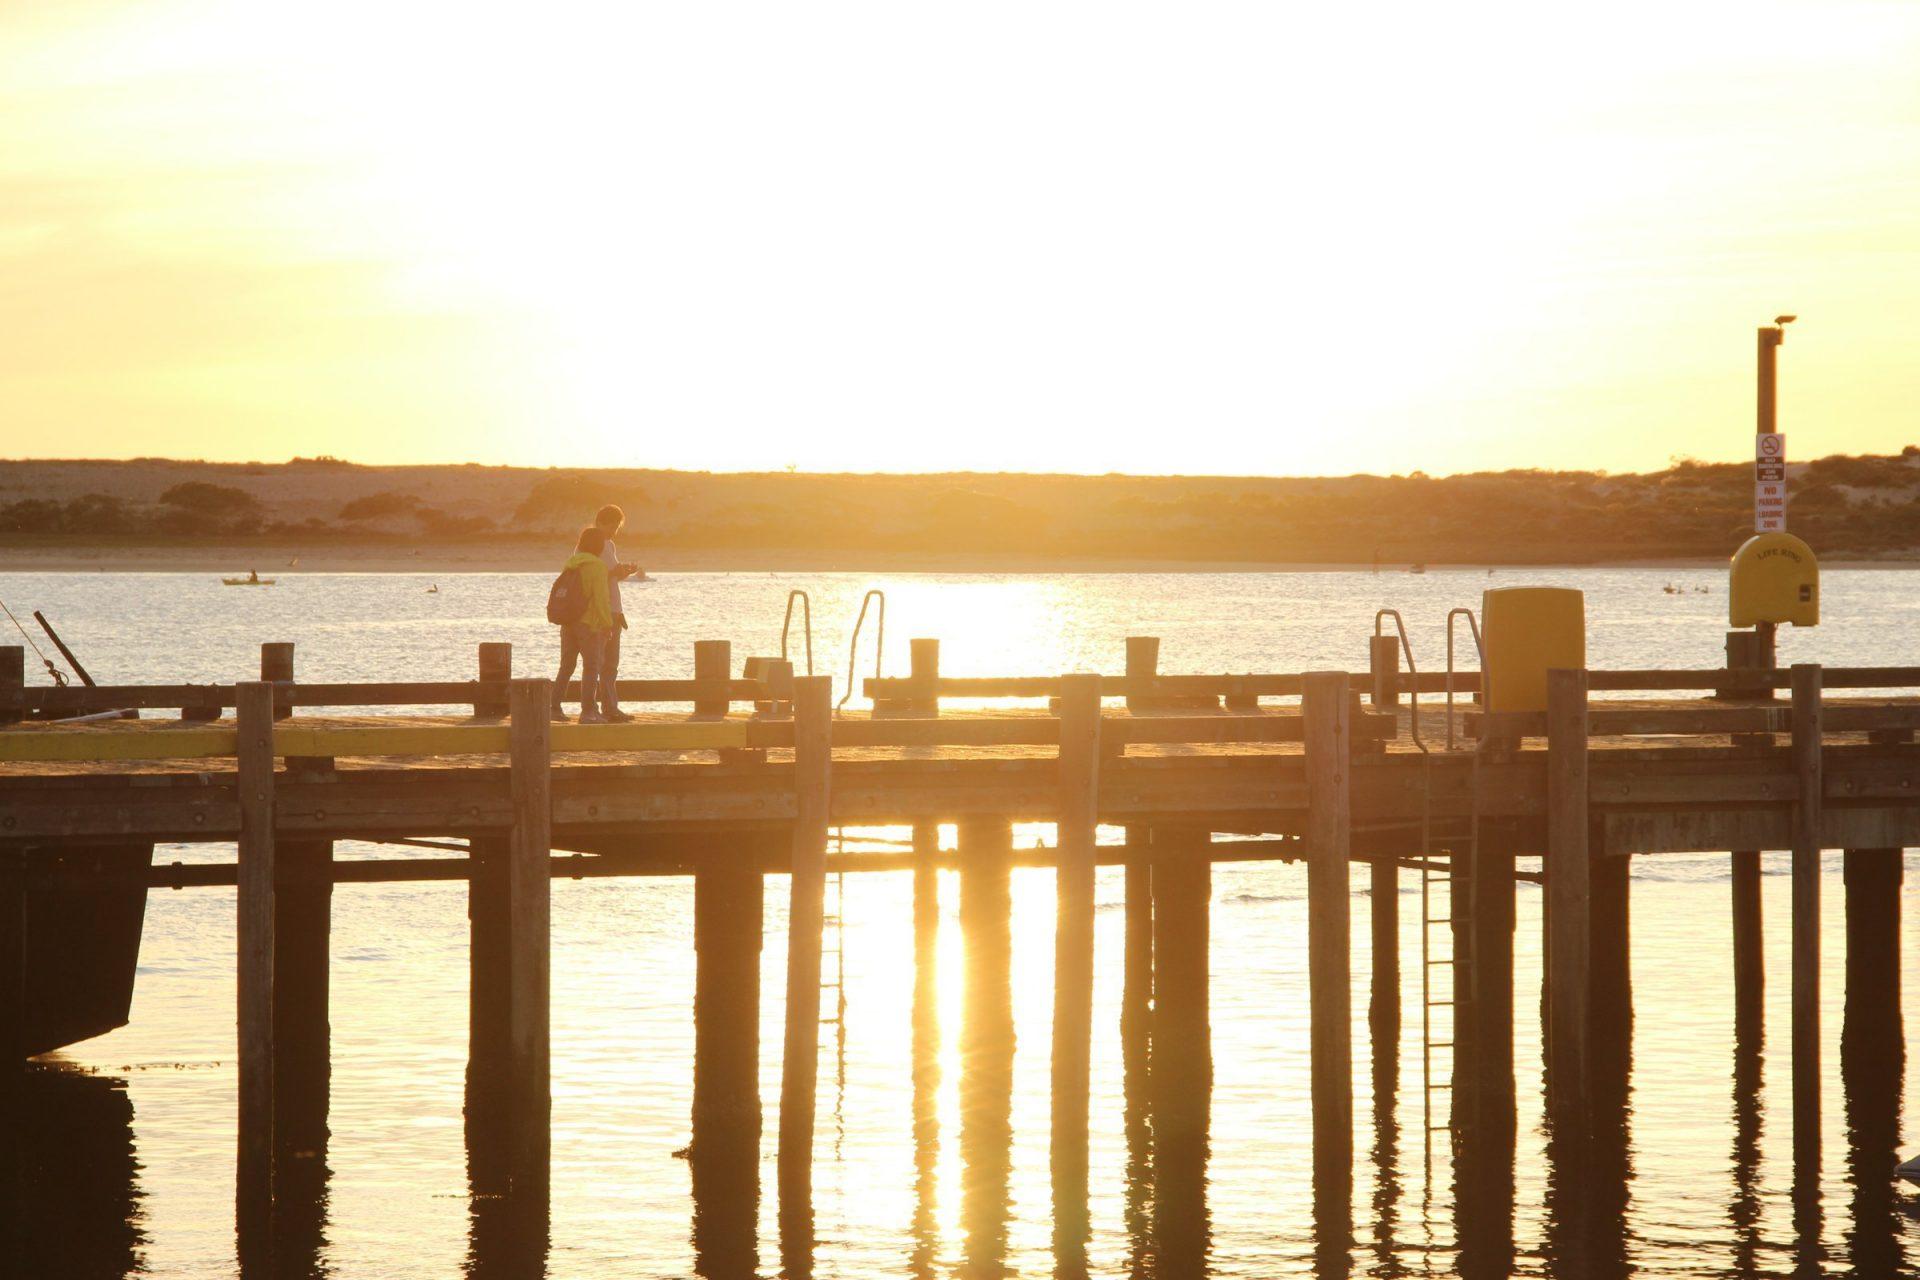 Two People Walking On Pier During Sunset